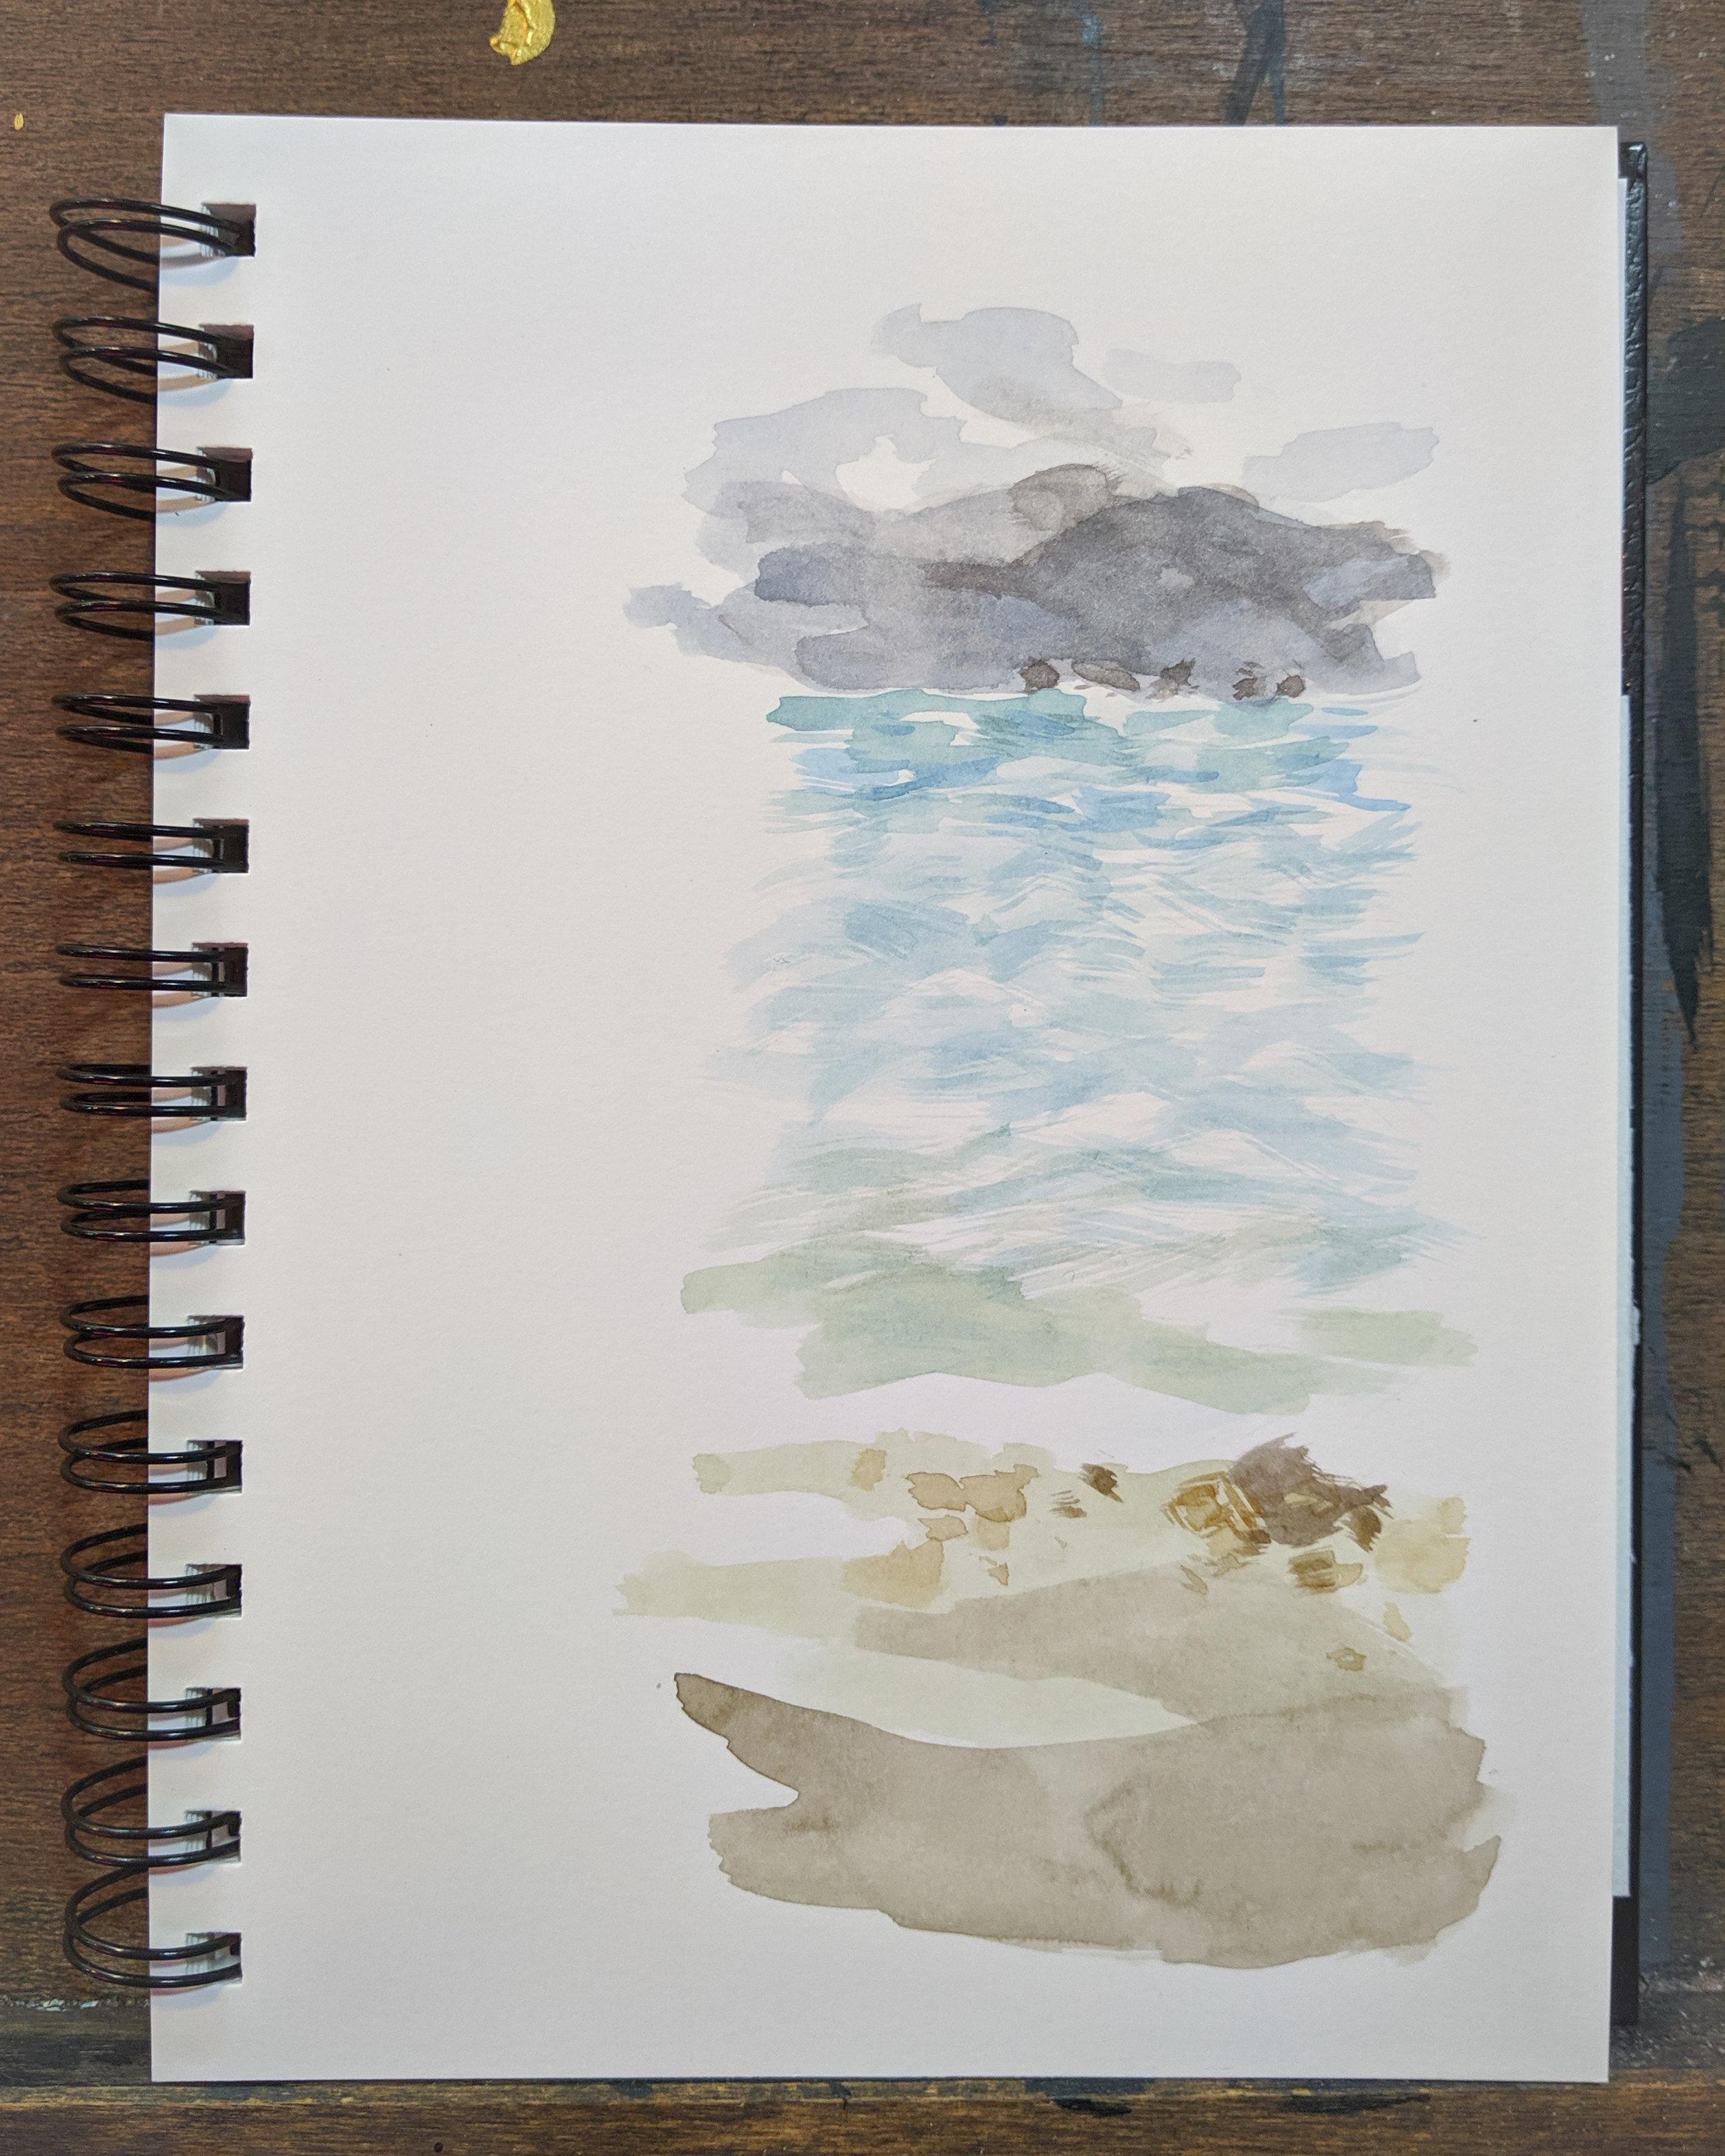 Saturday the 21st - Bear Lake, I